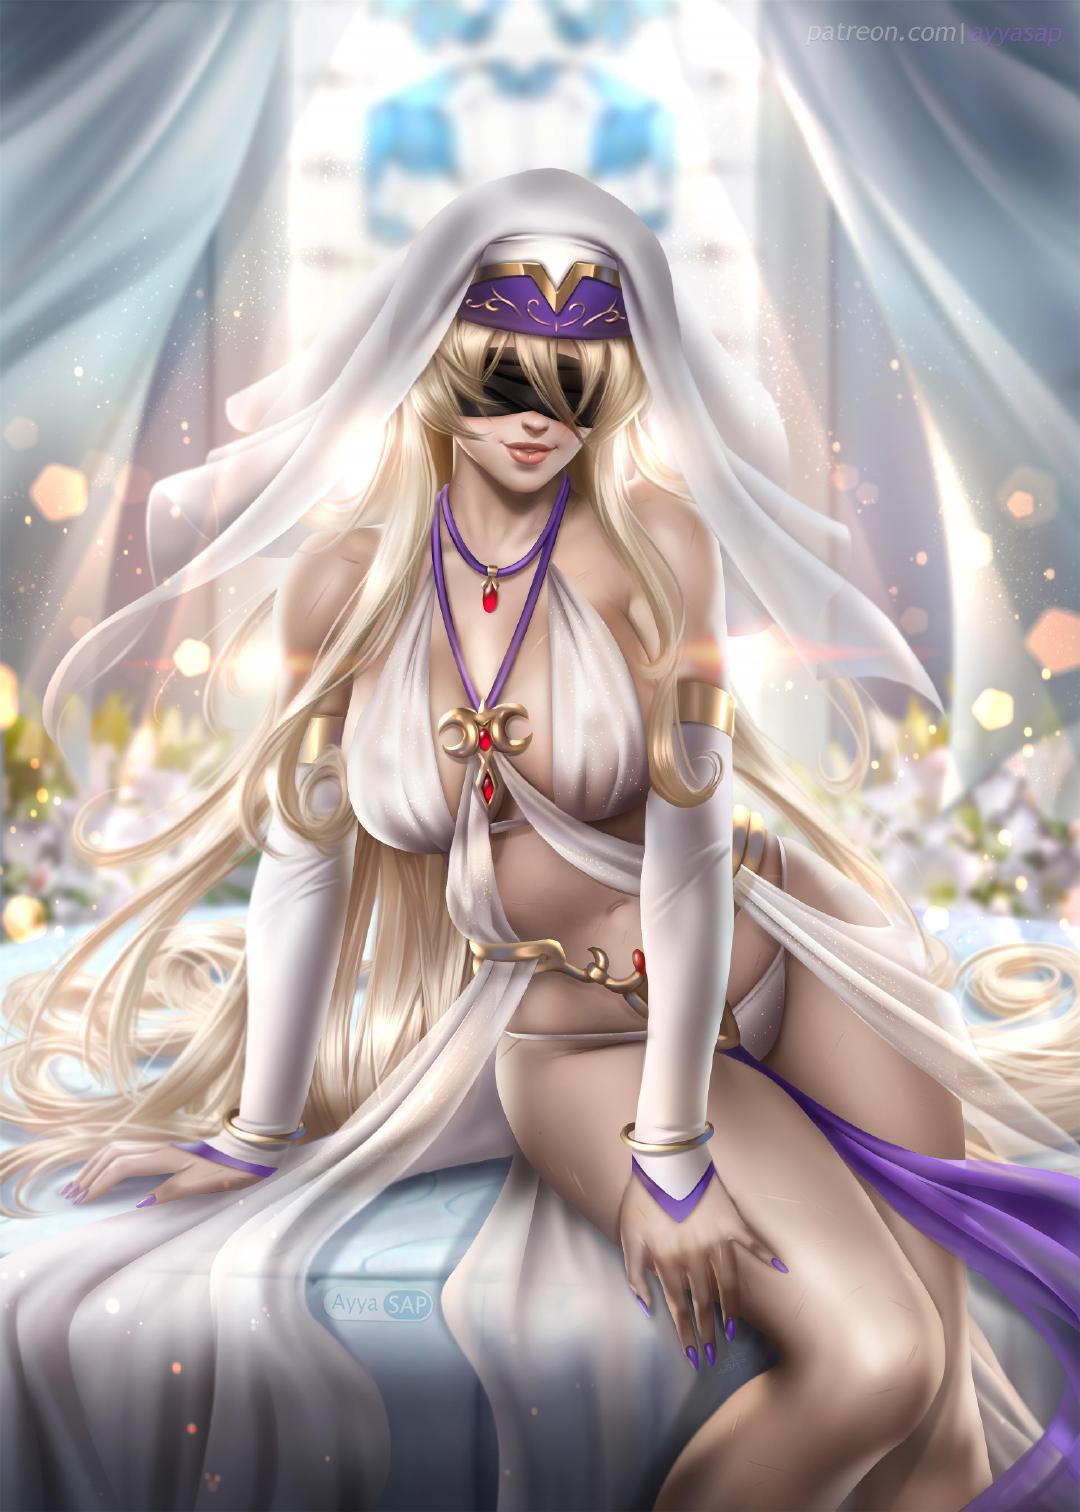 Sword Maiden Ayyasap Goblin Slayer